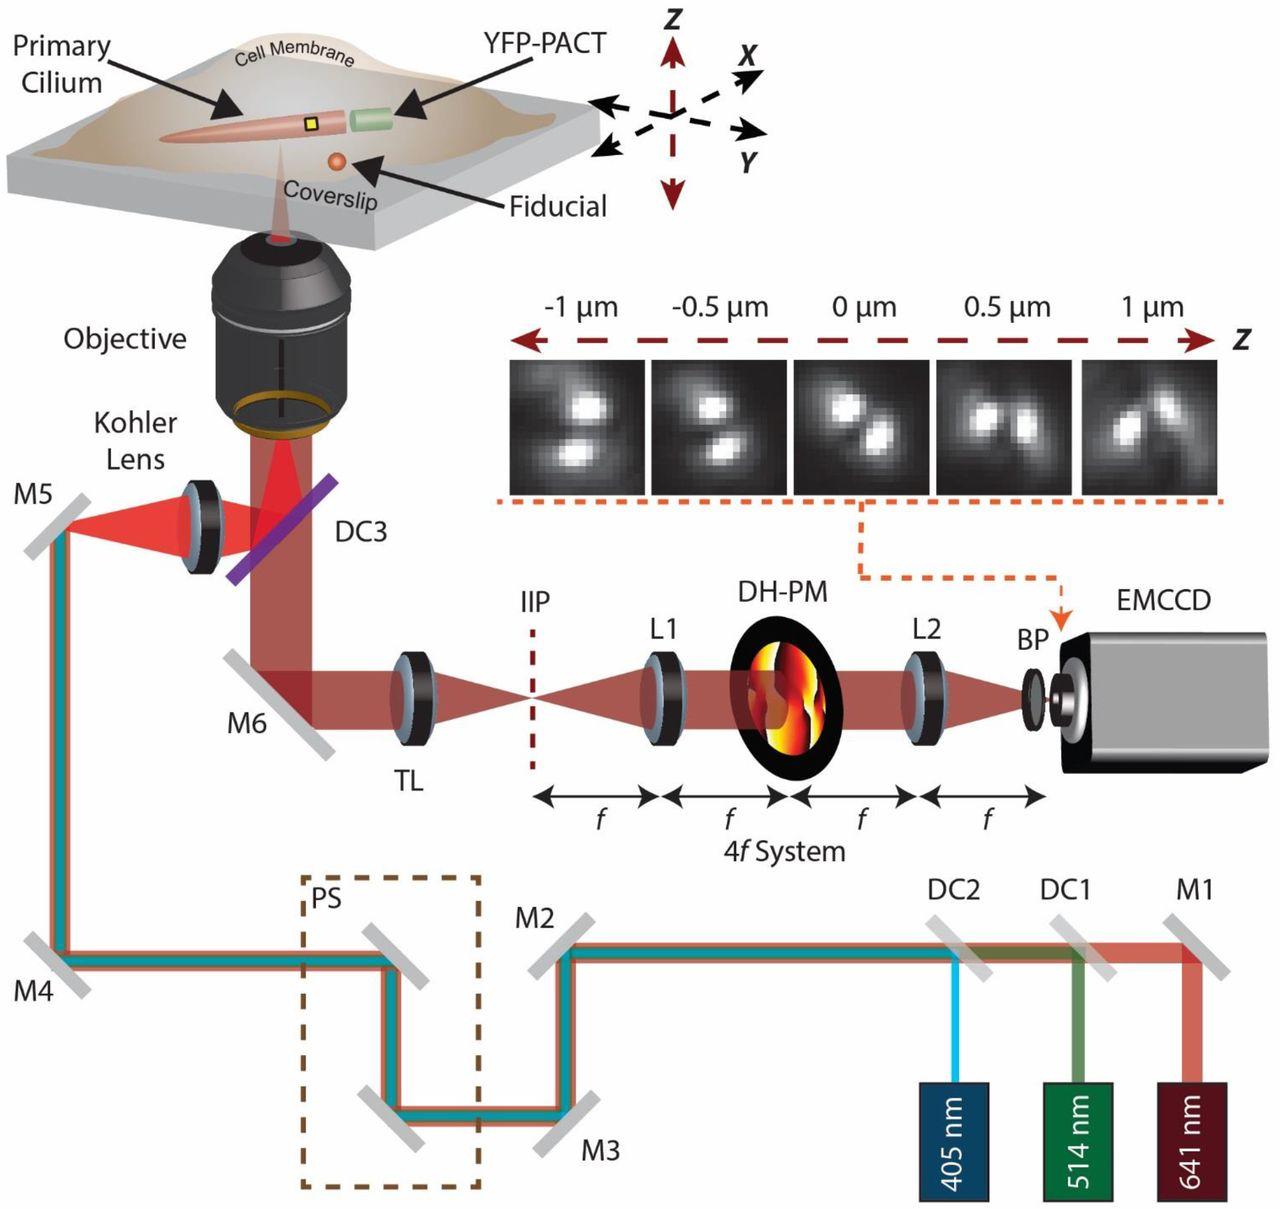 Revealing the nanoscale morphology of the primary cilium using super